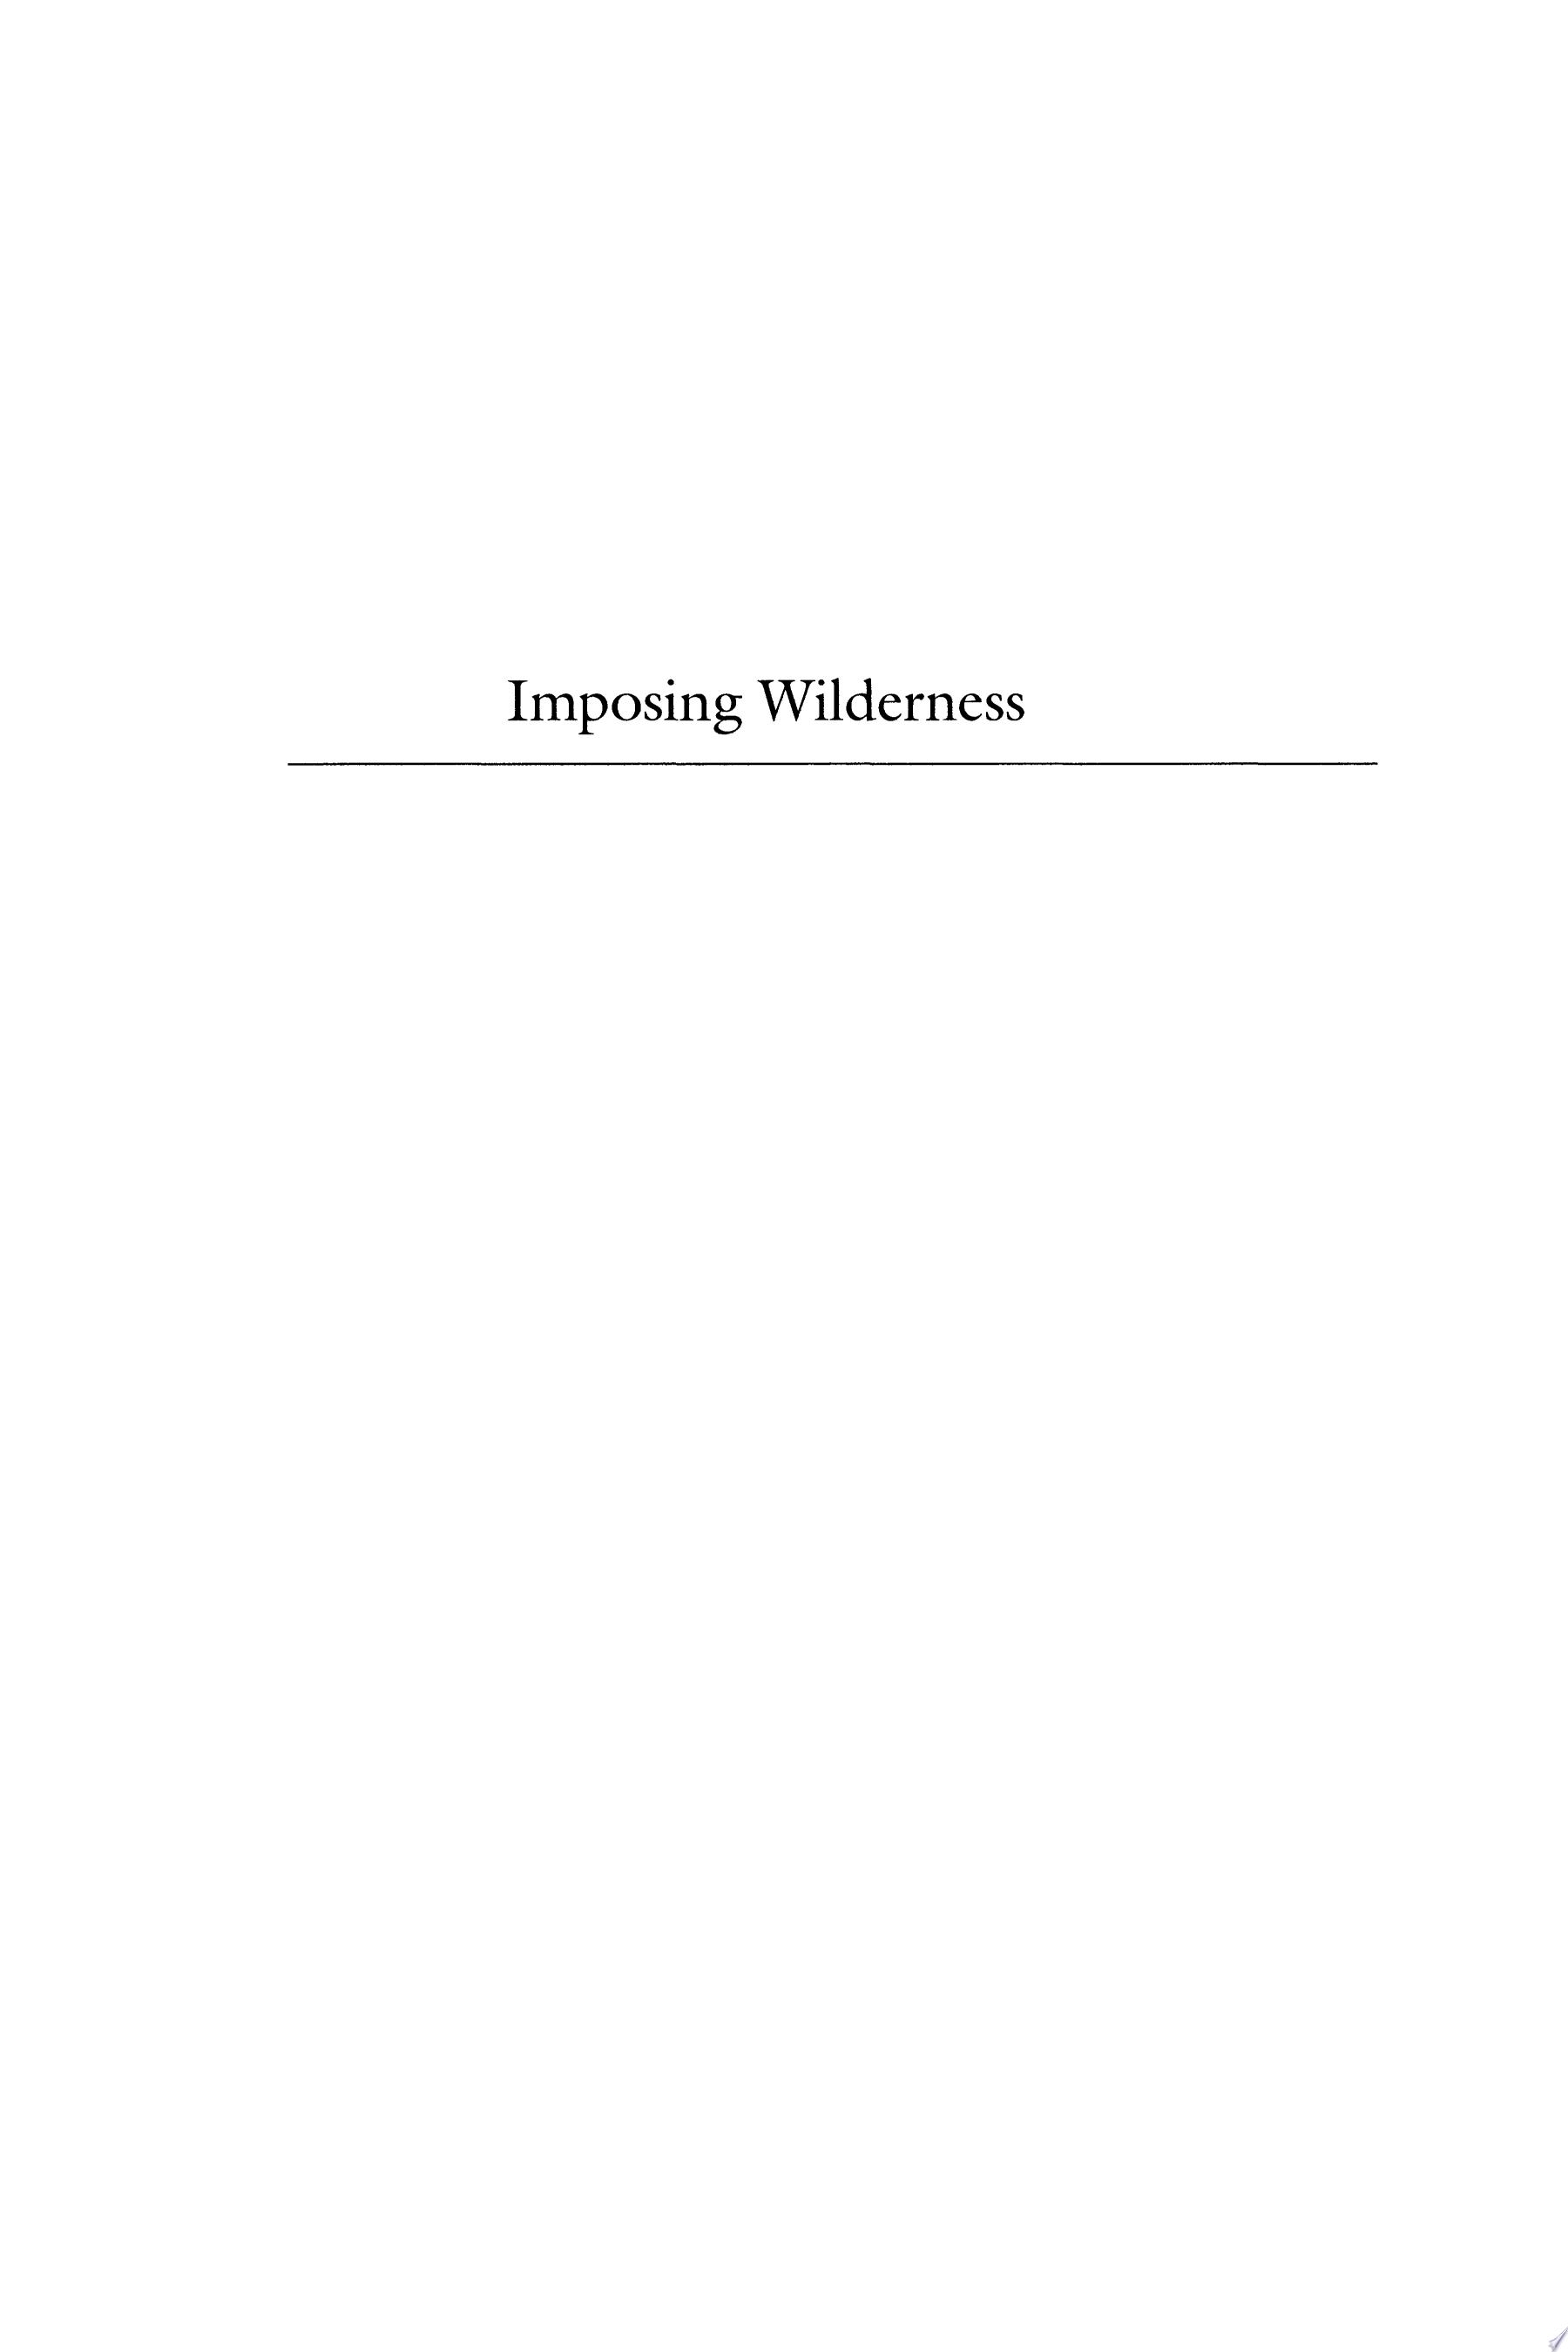 Imposing Wilderness